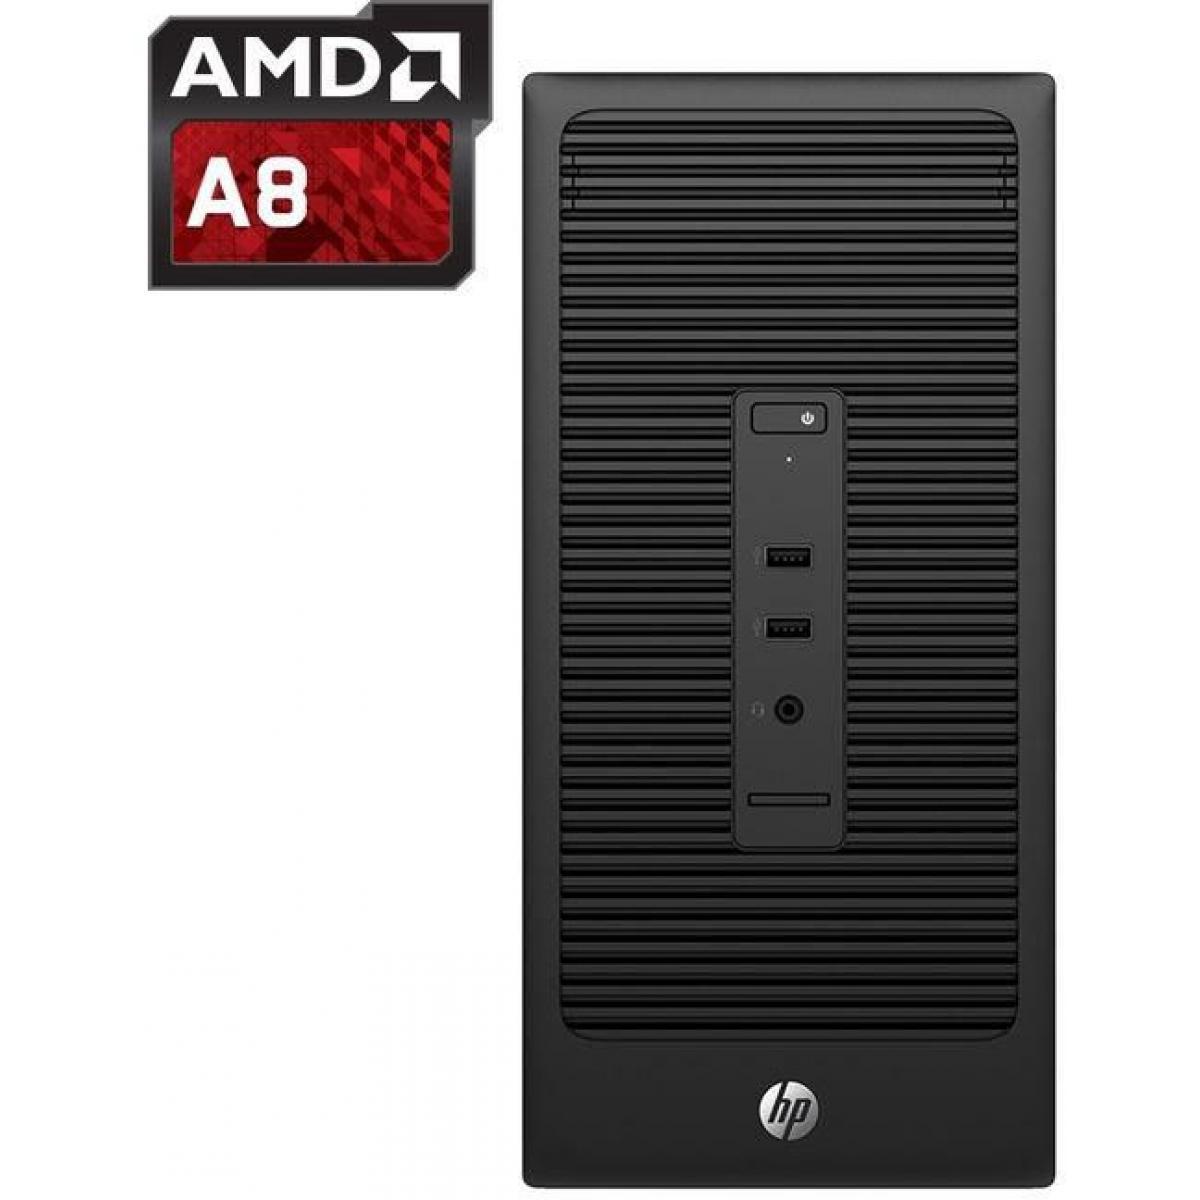 HP 285 G2 Microtower AMD A8 Pro 7600 Quad Core PC